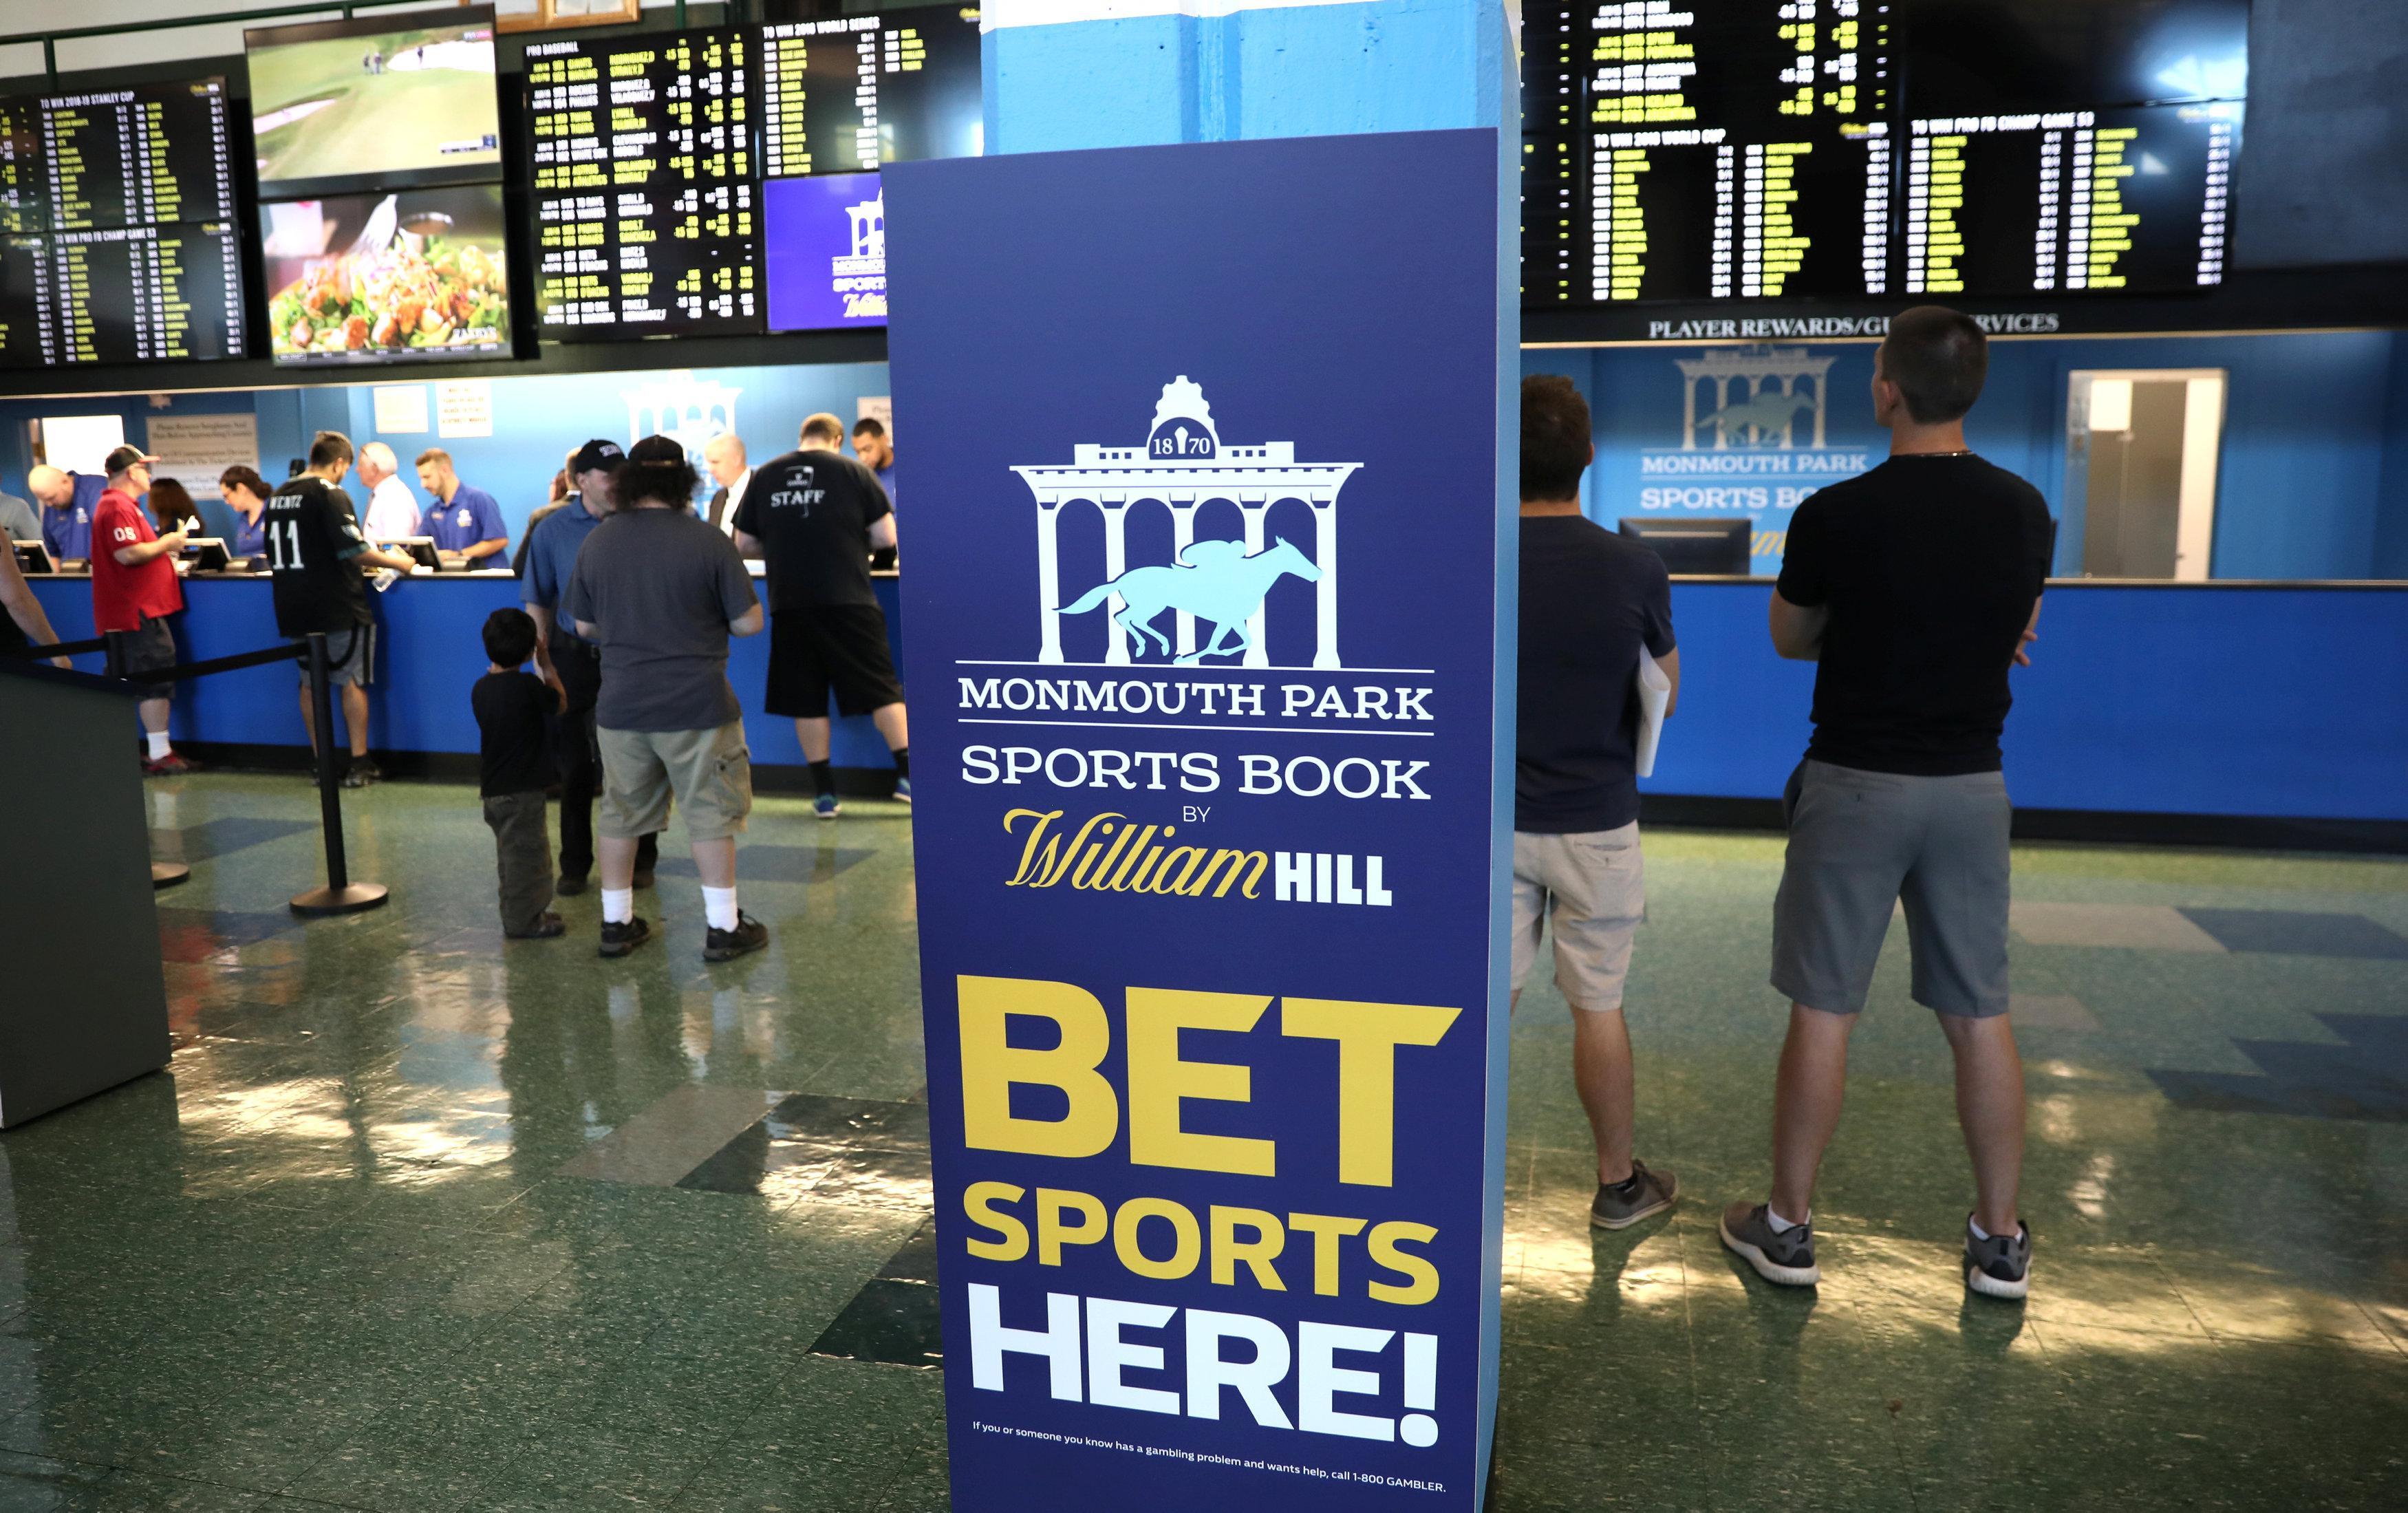 Nj sports betting legislation images mybitcoins gadget bitstamp